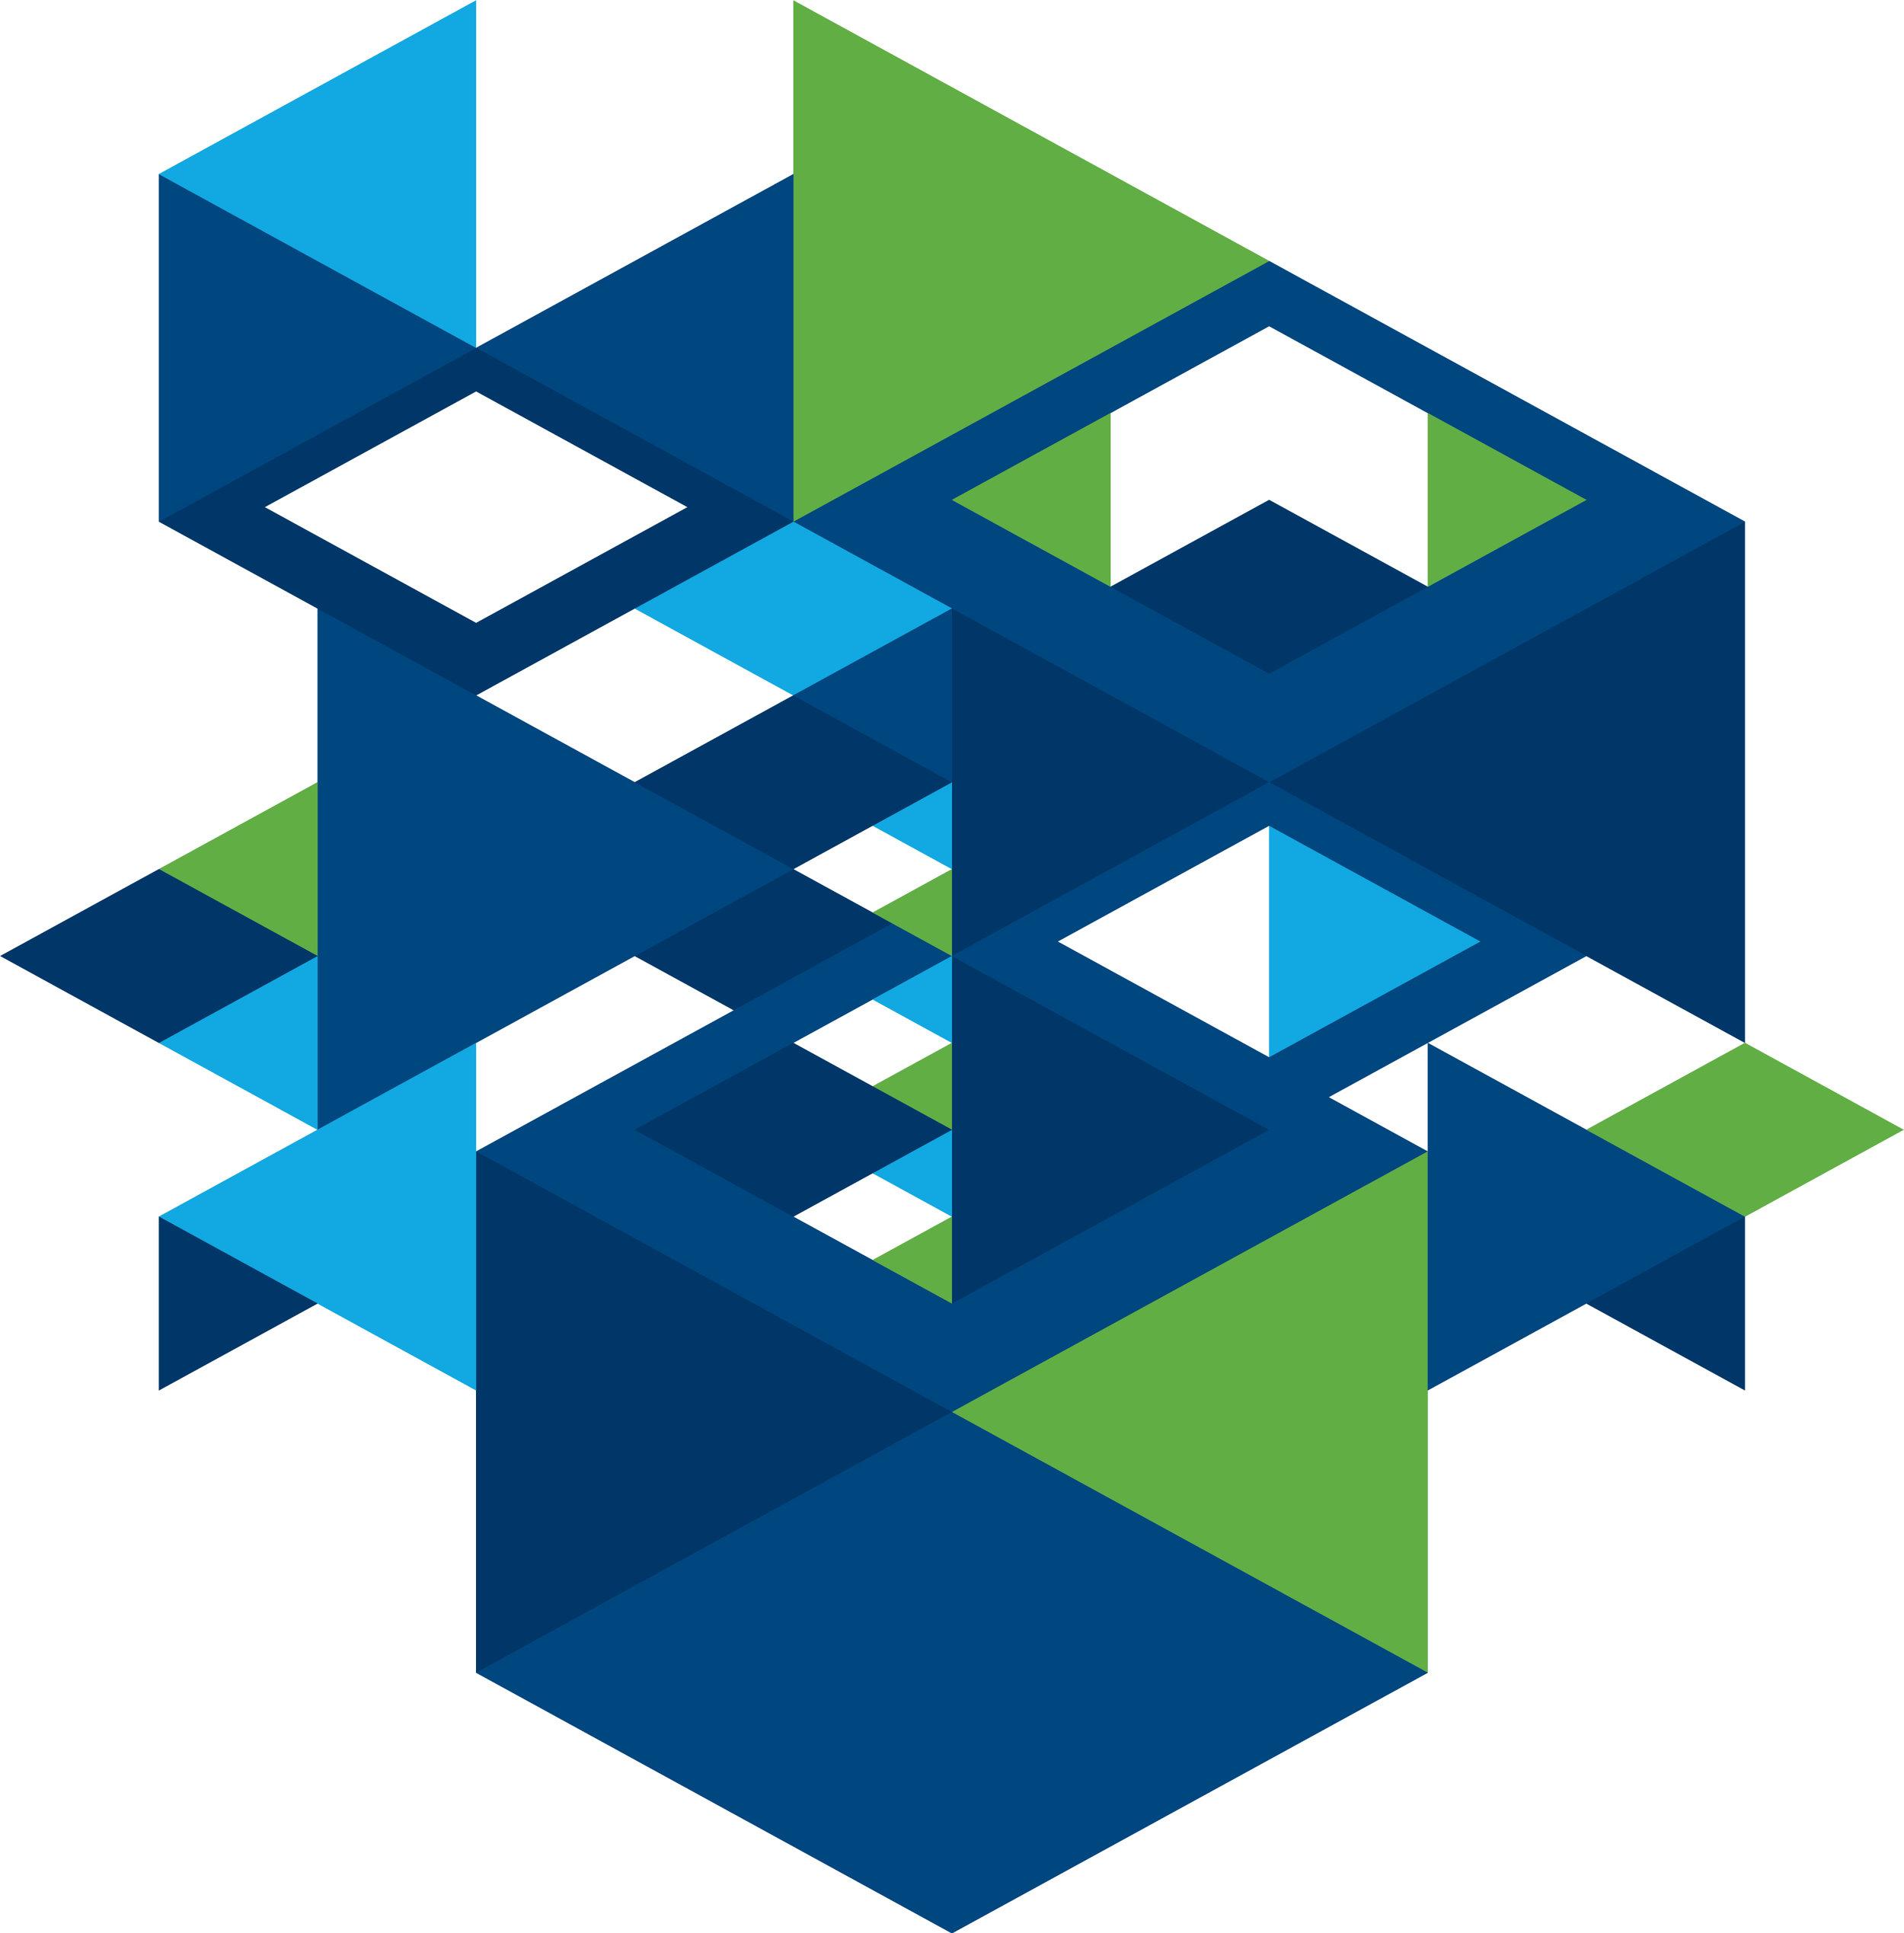 NVS visual identity refresh using existing logo